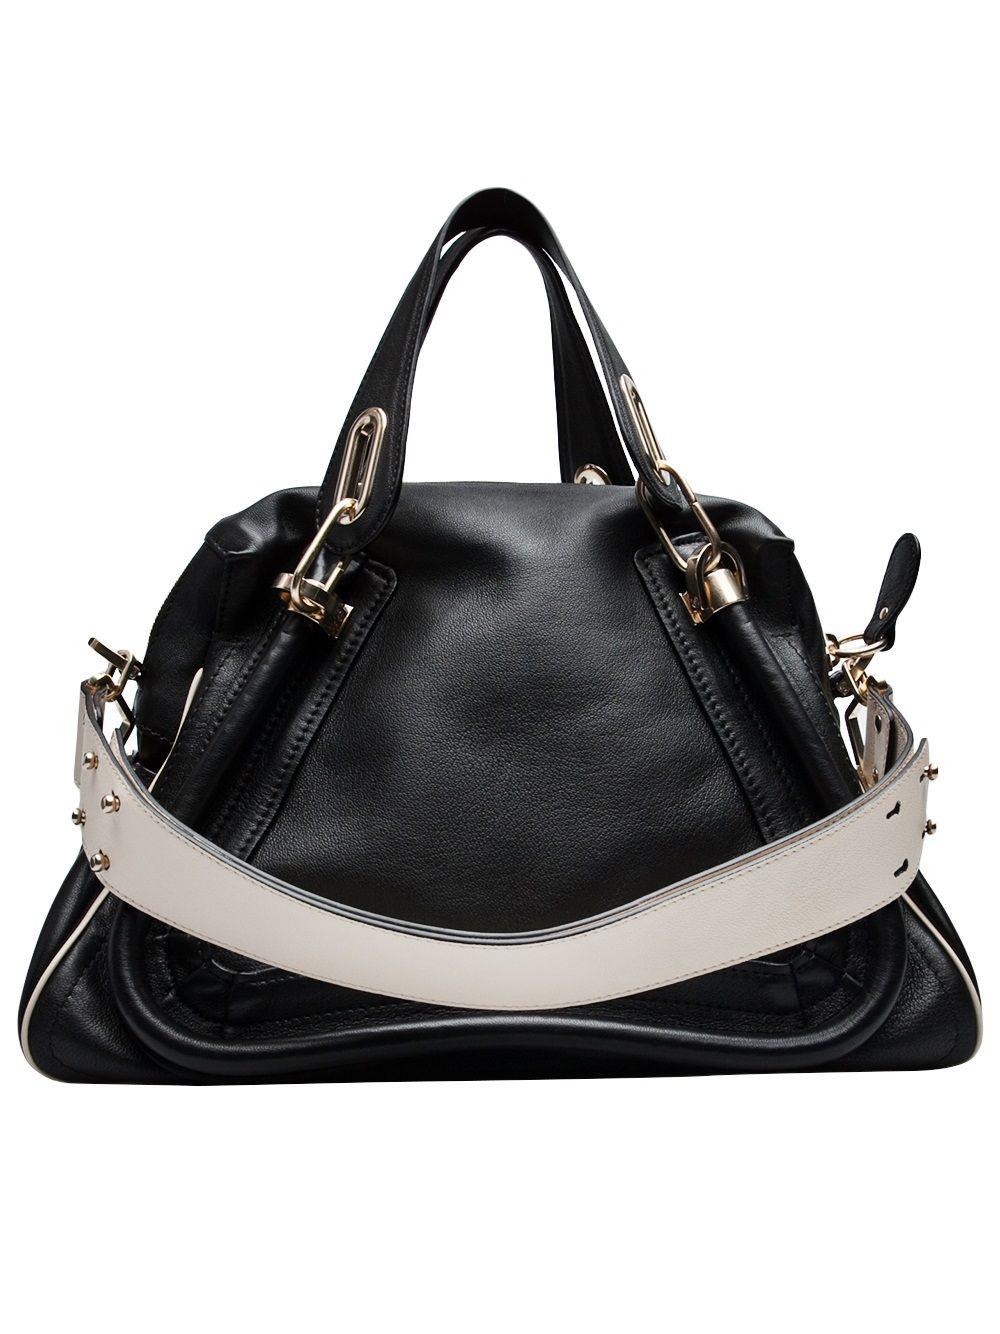 60f833eae37f CHLOE - Paraty Bag with military strap